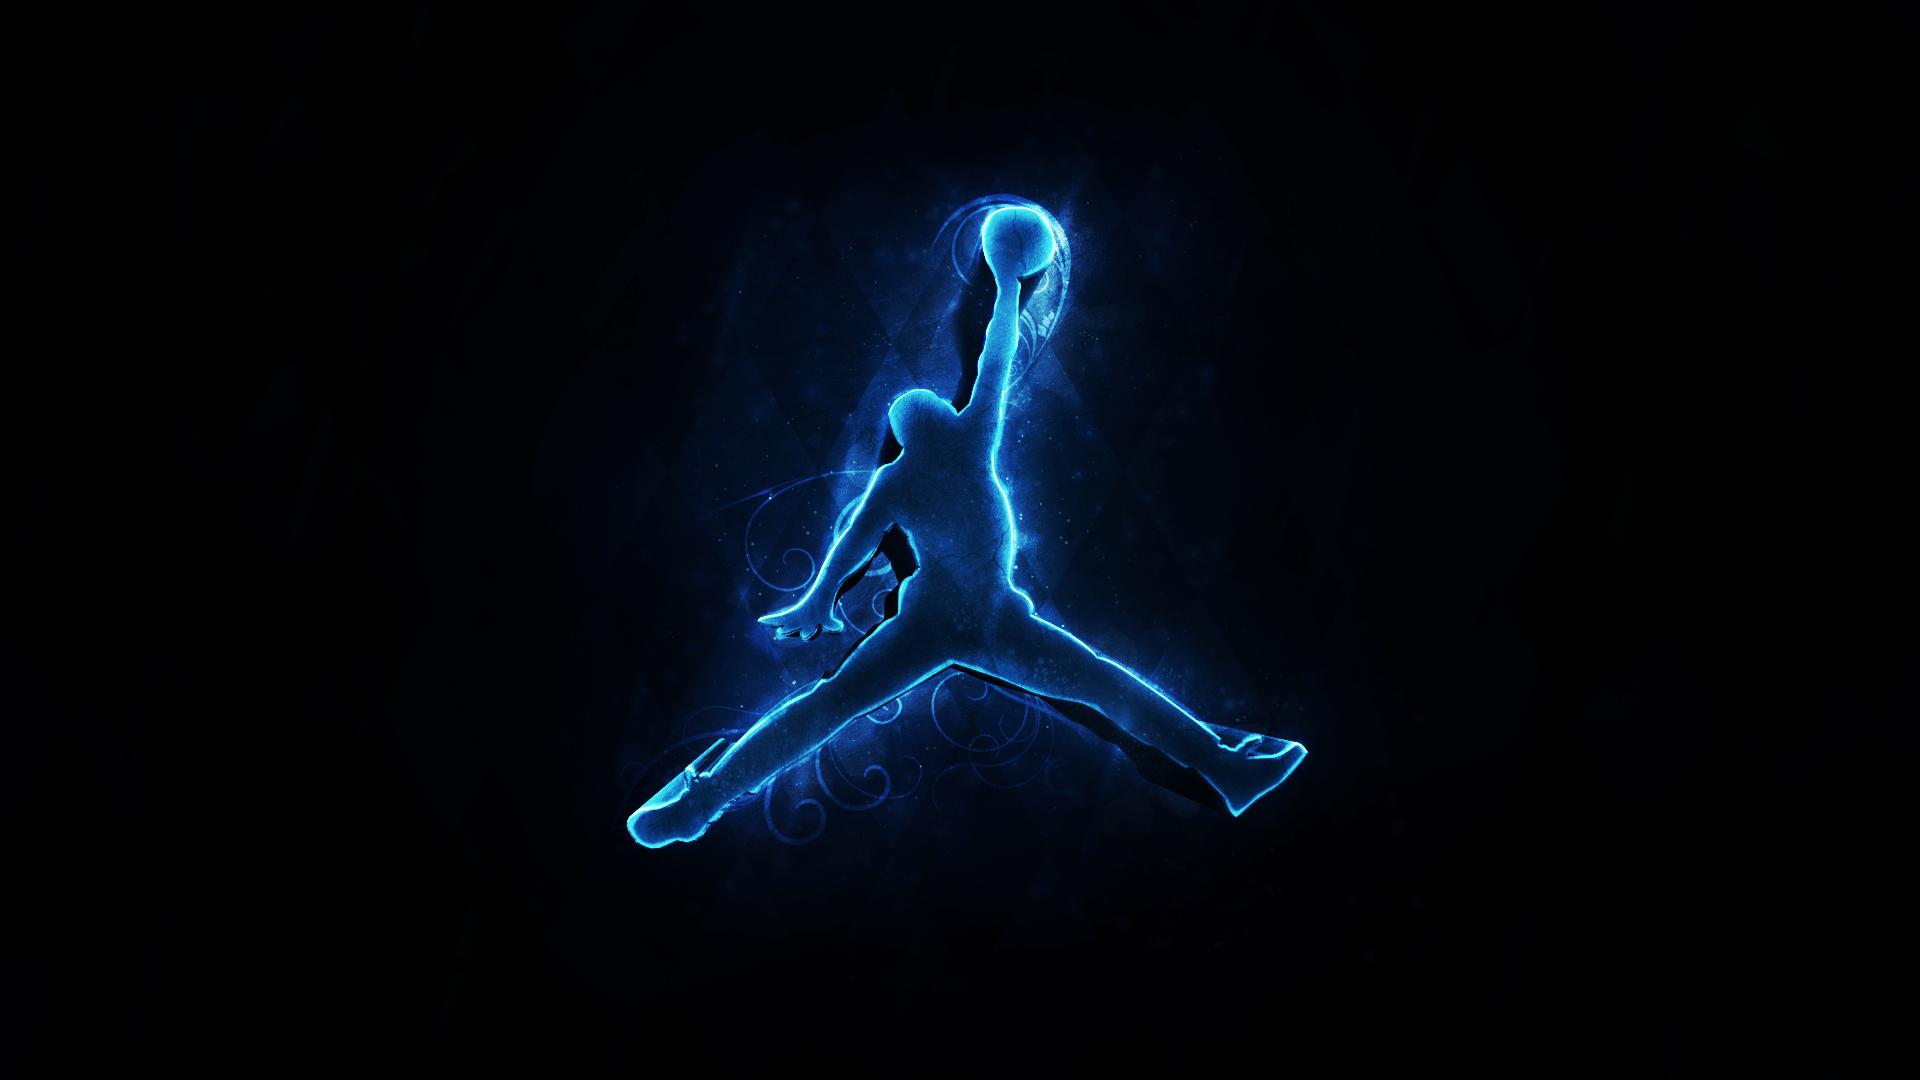 Michael Jordan Free Wallpapers Themed Jordan Logo Wallpaper Logo Wallpaper Hd Jordan Logo